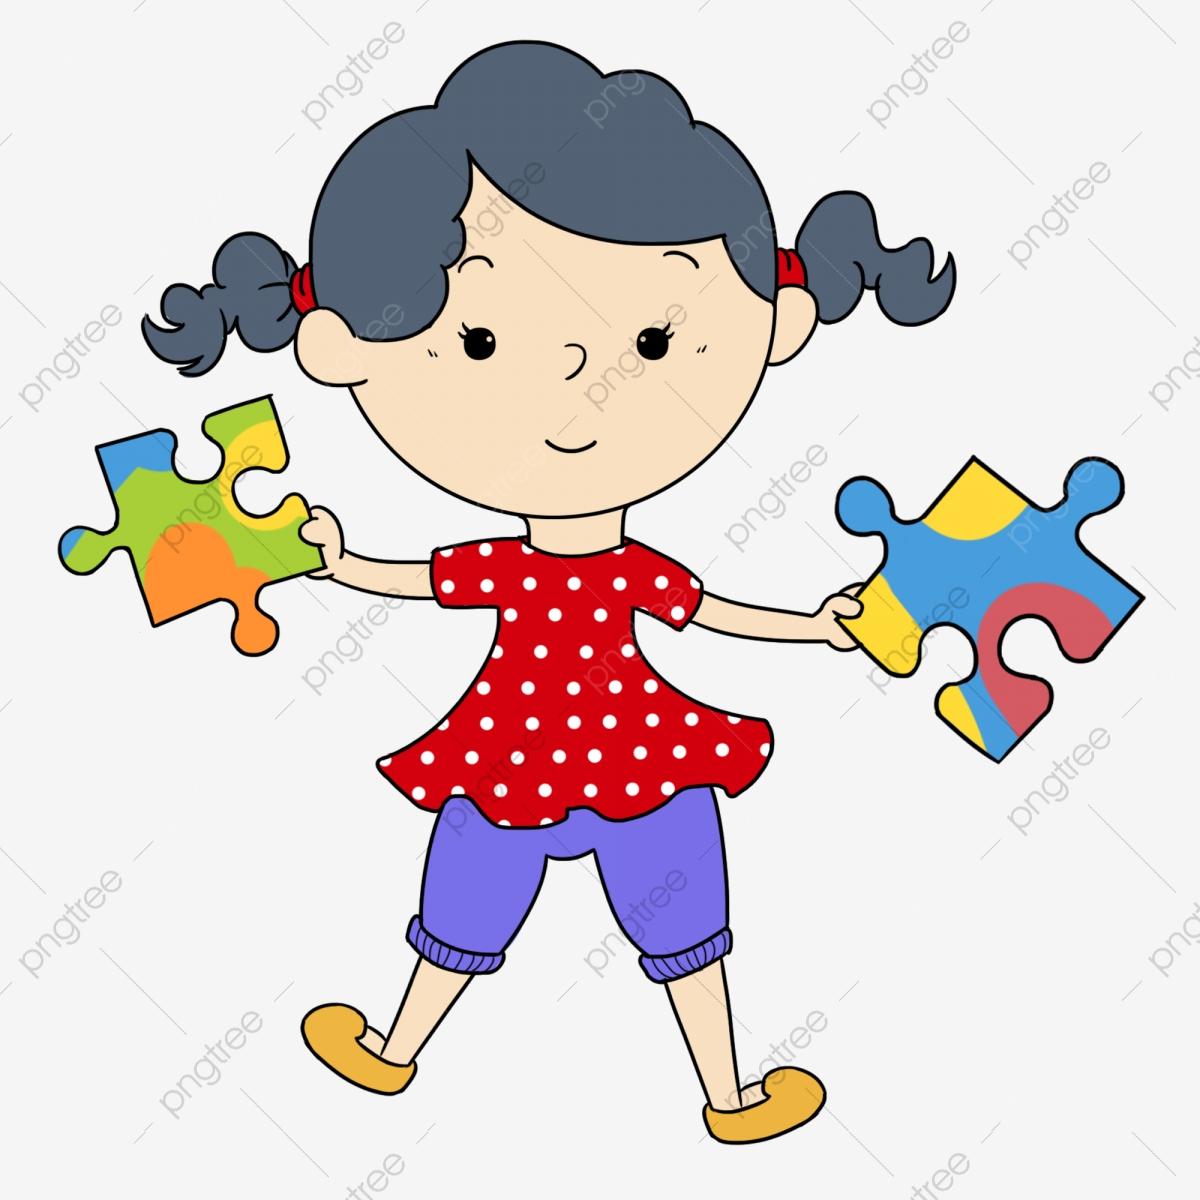 Intellectual game jigsaw summer. Puzzle clipart cute